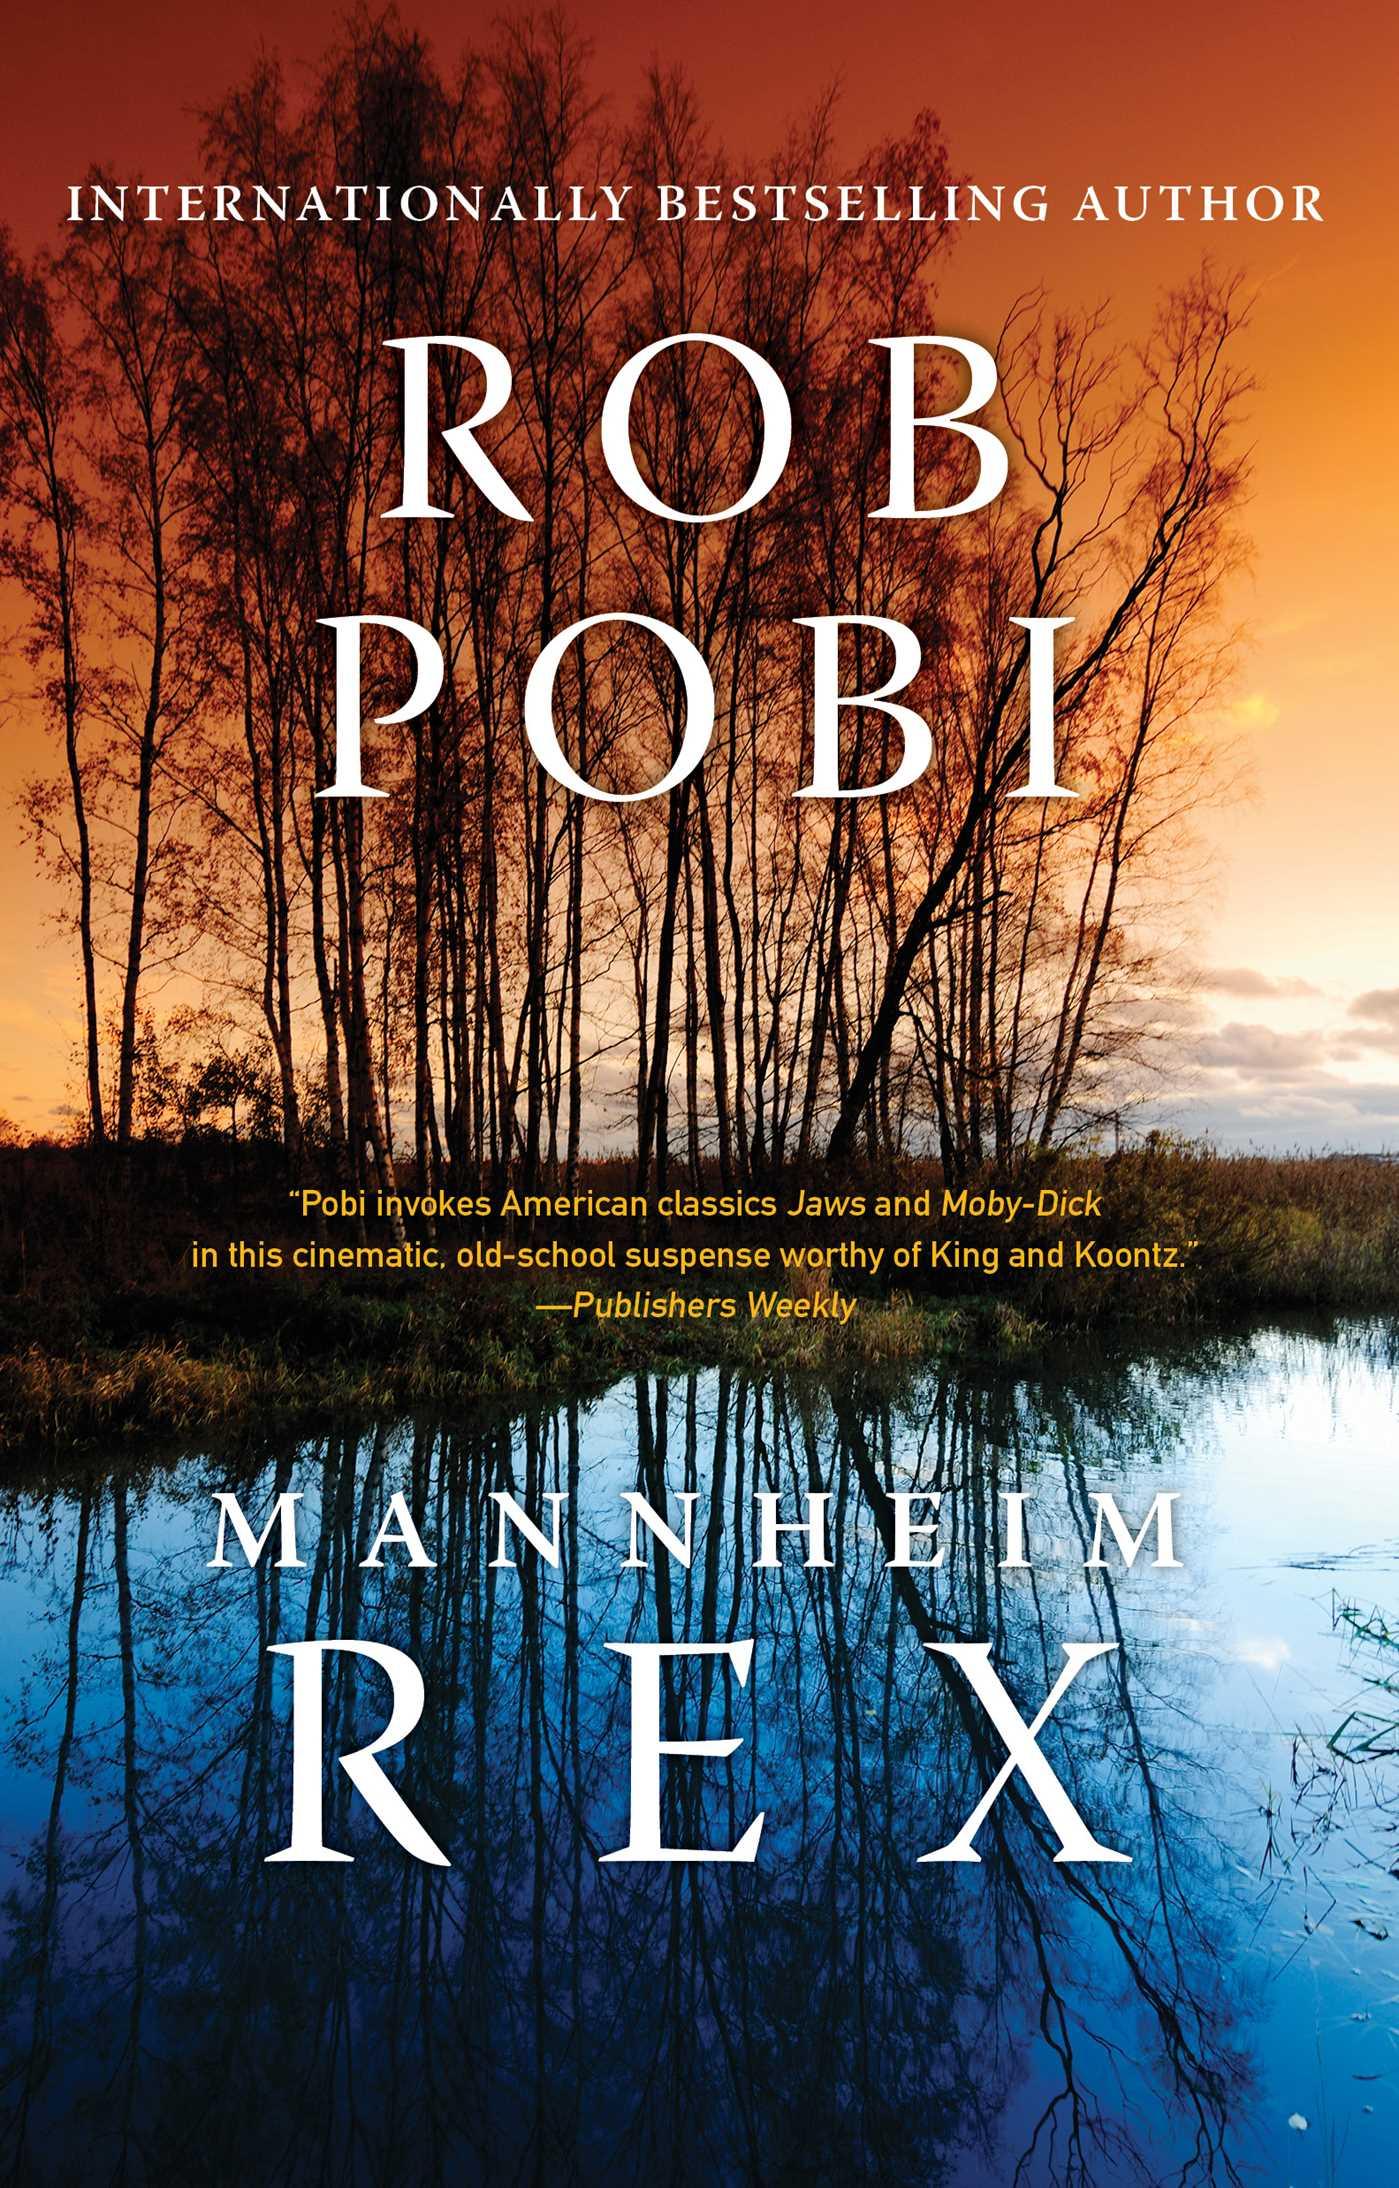 Mannheim rex 9781451654936 hr